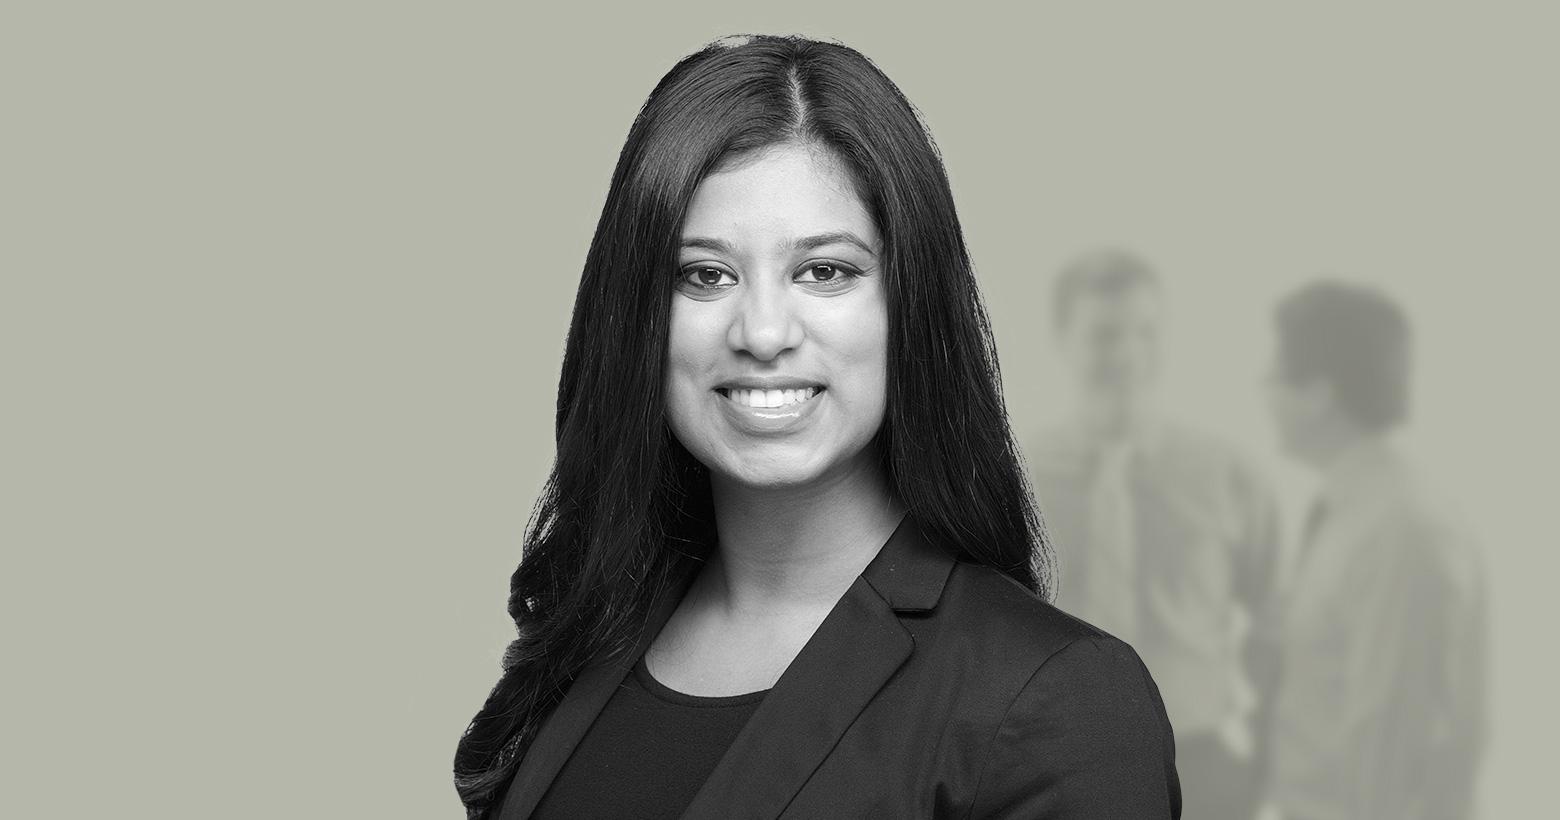 Sheena Shah